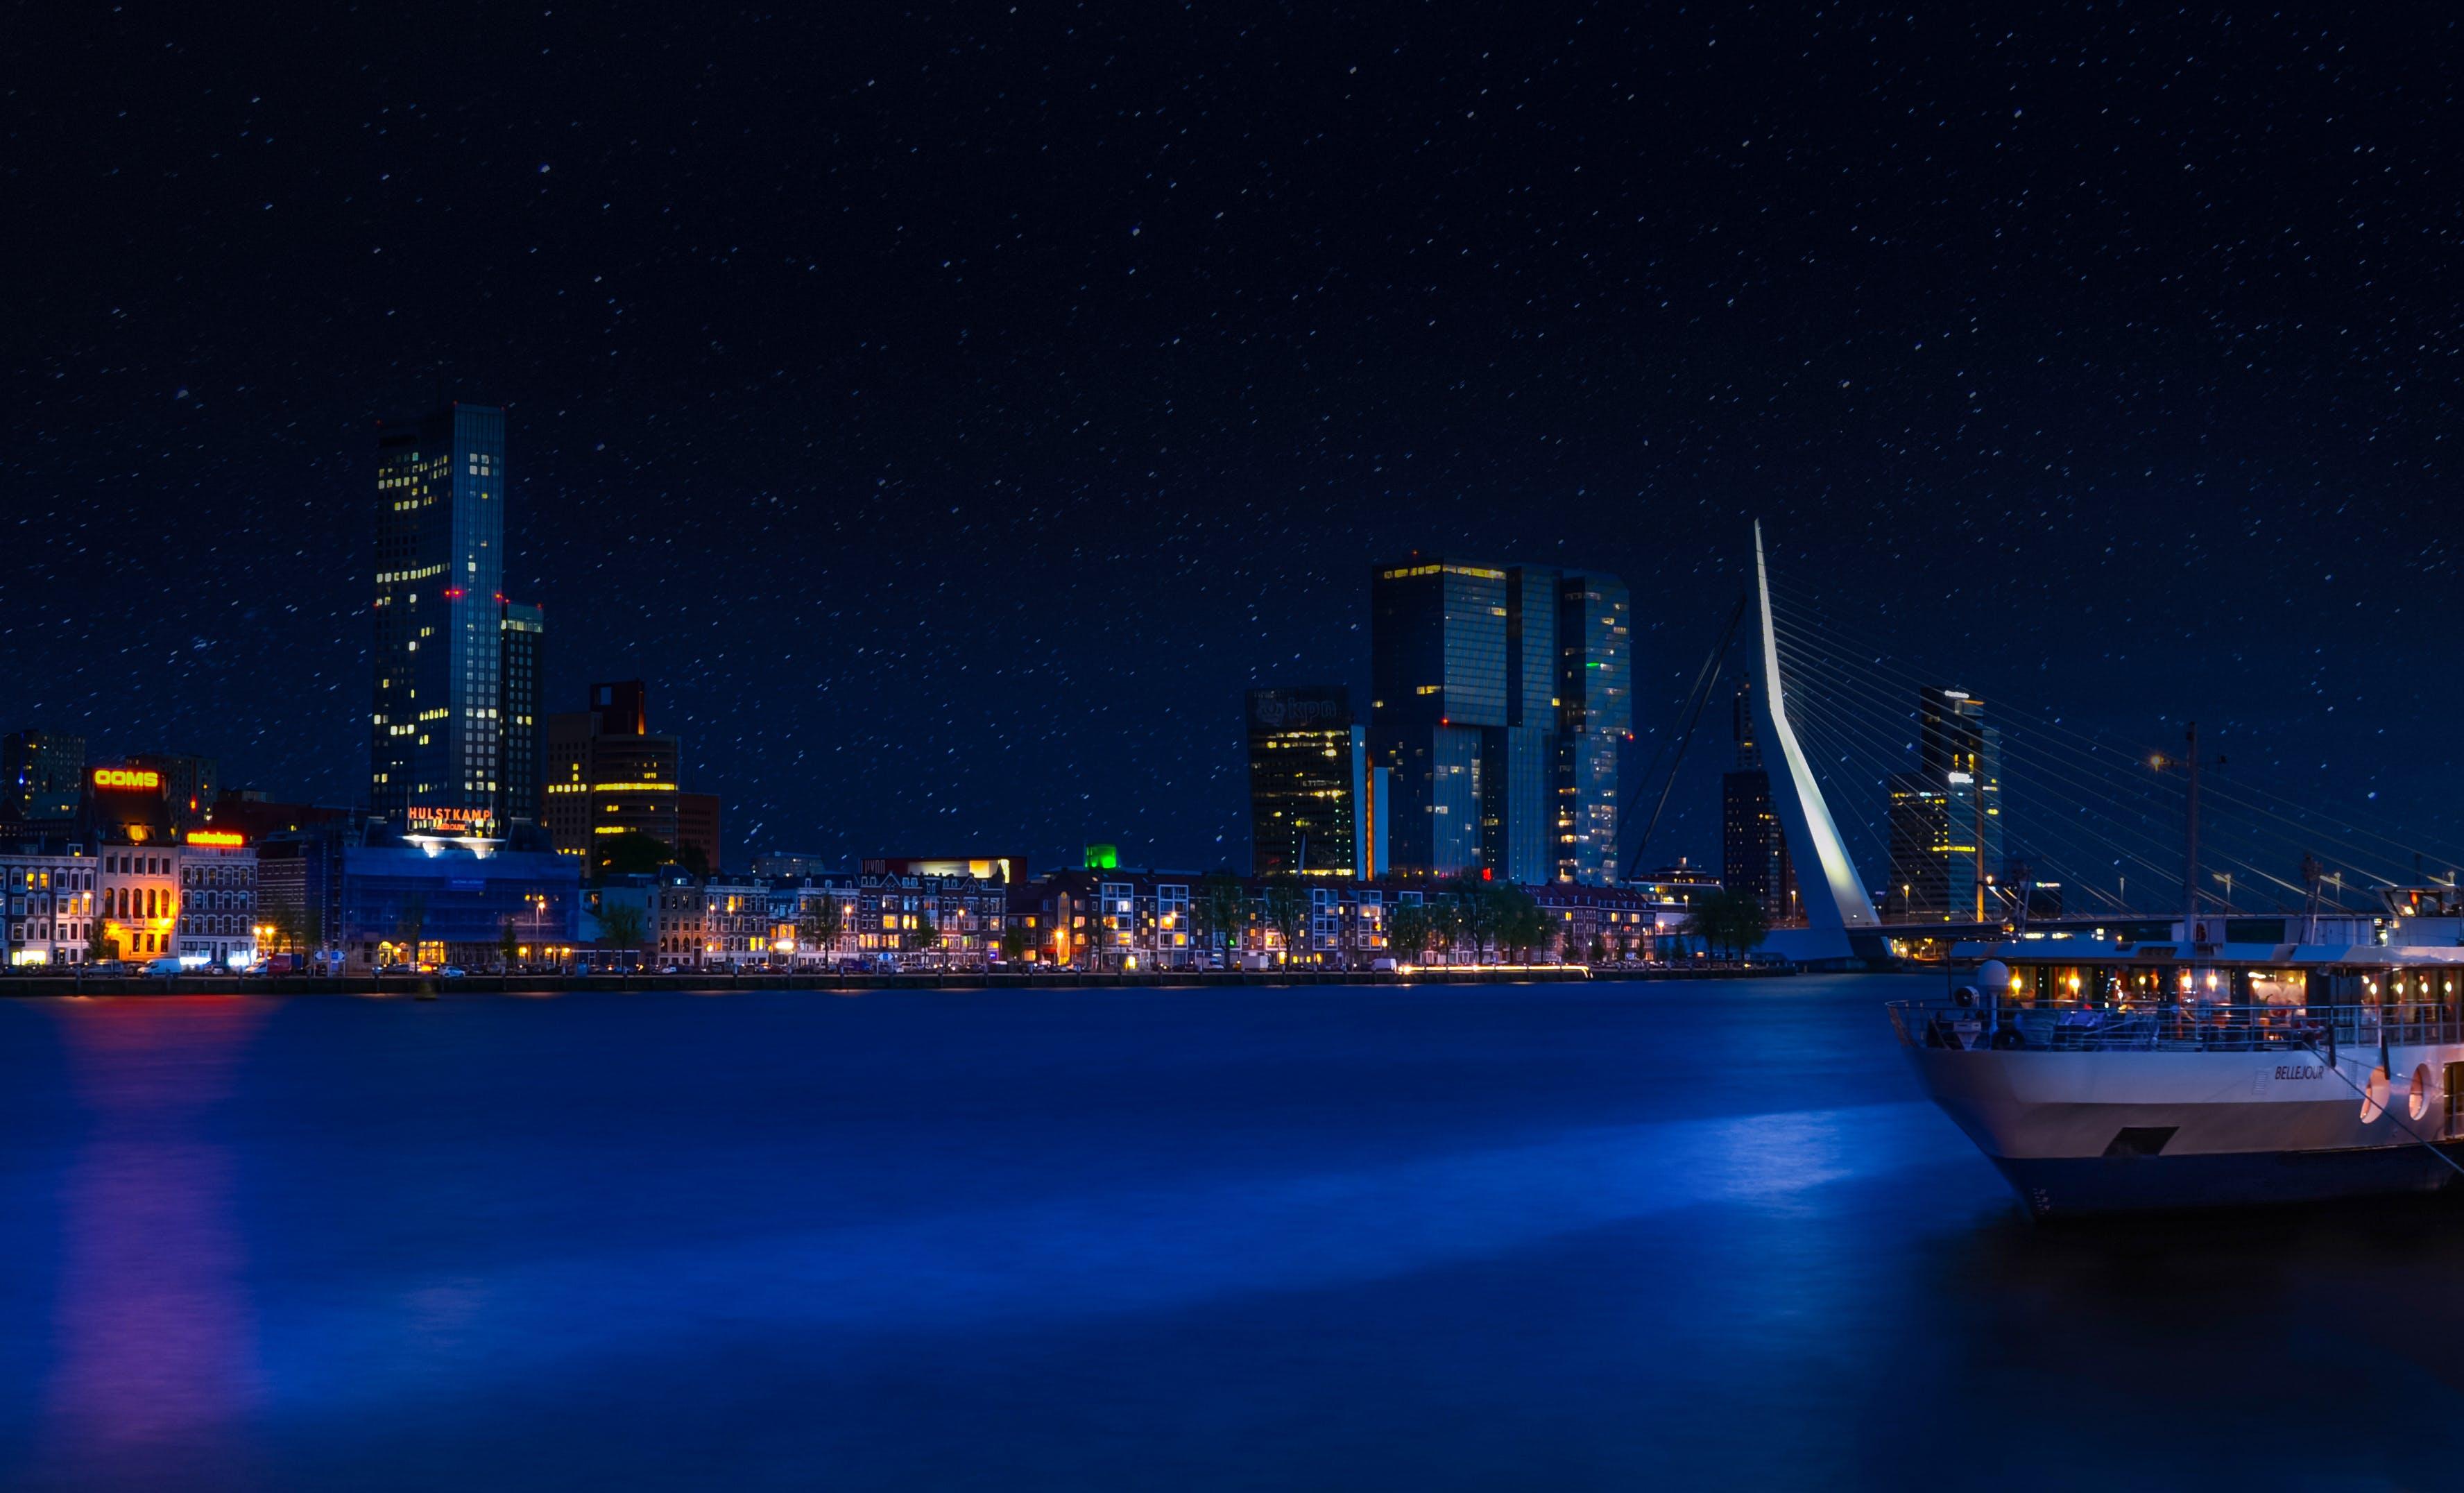 City Skyline Under Clear Sky during Nighttime